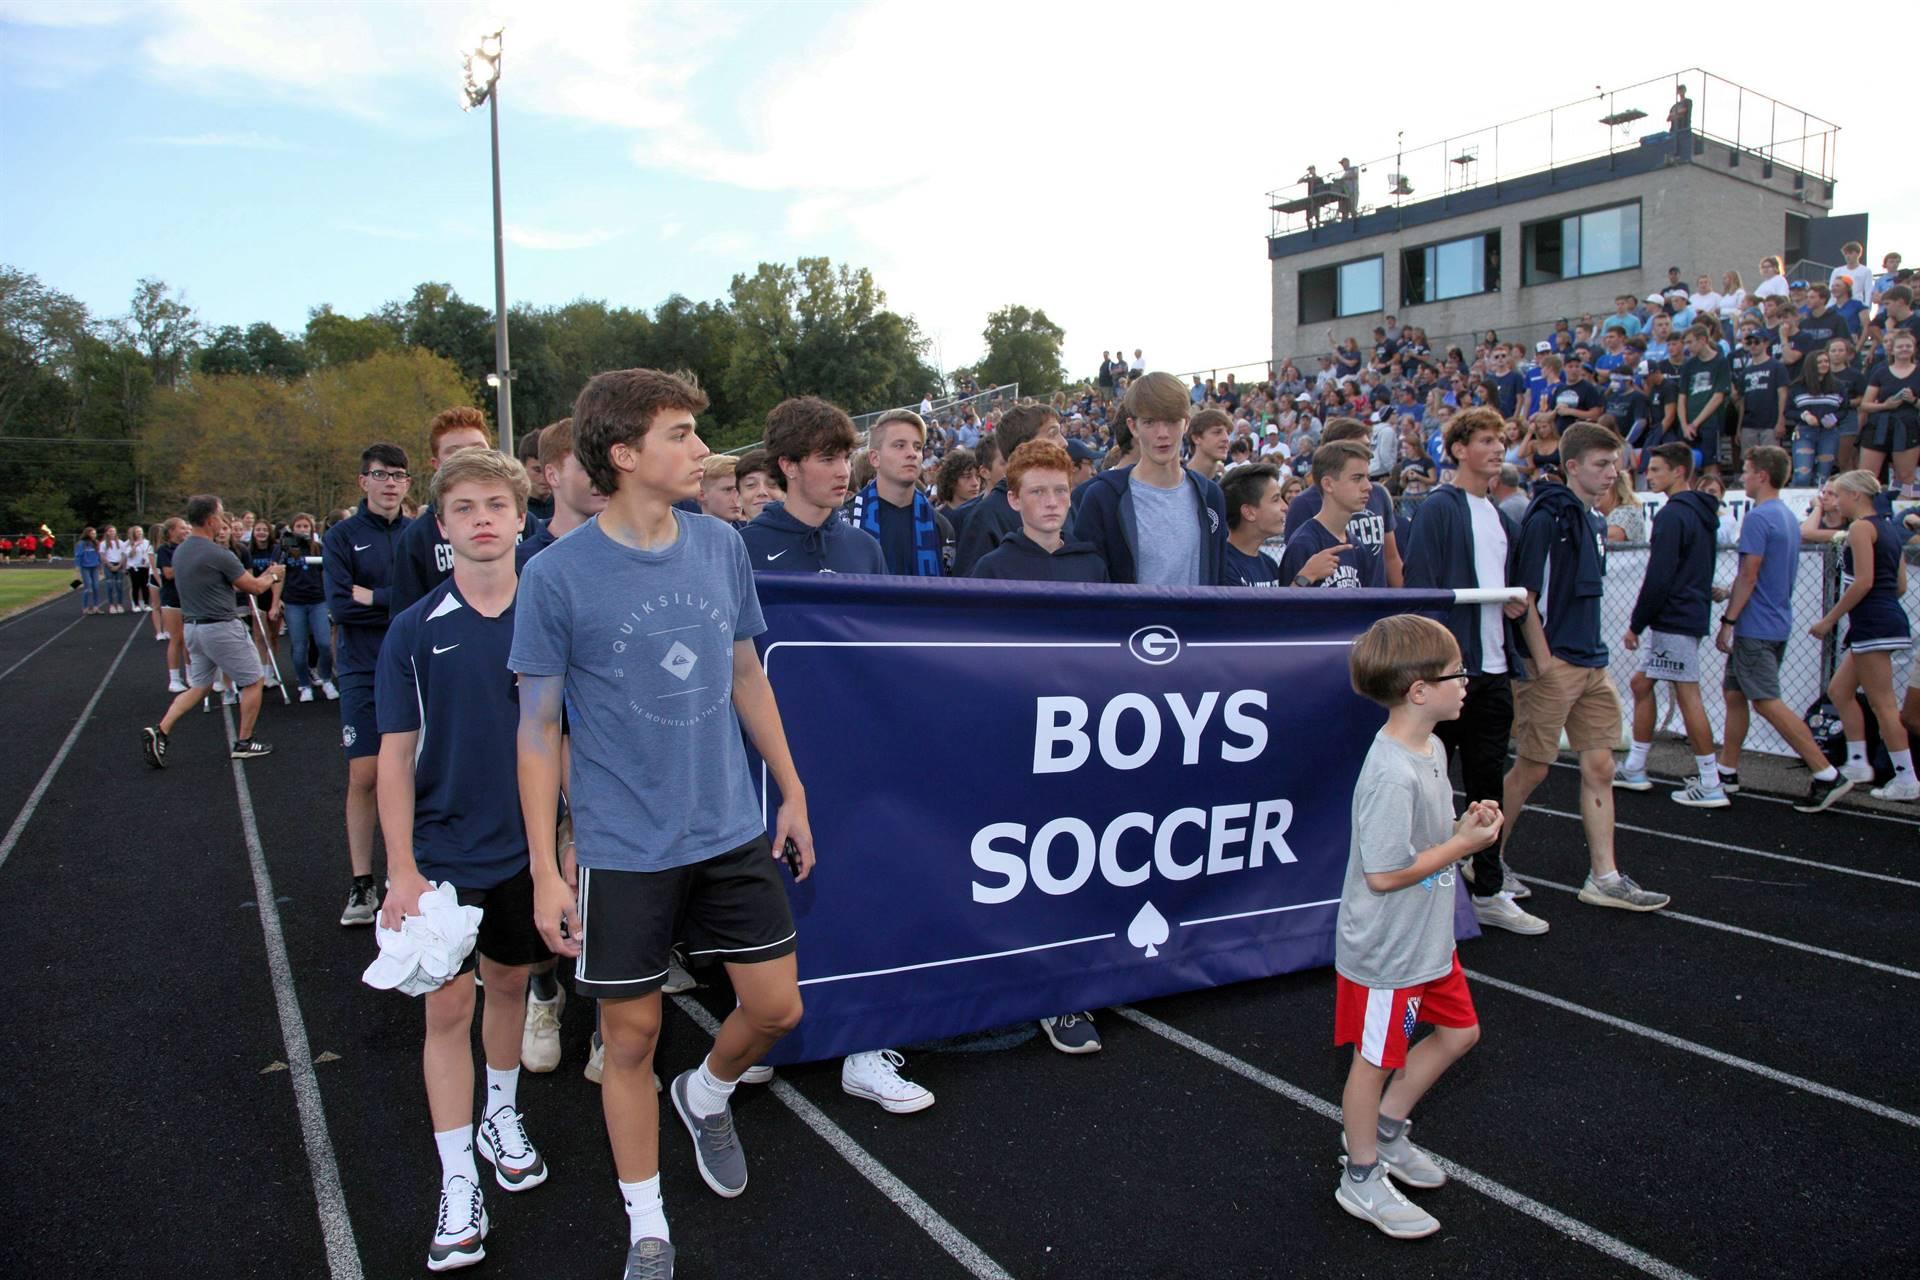 Boys Soccer in Homecoming Parade